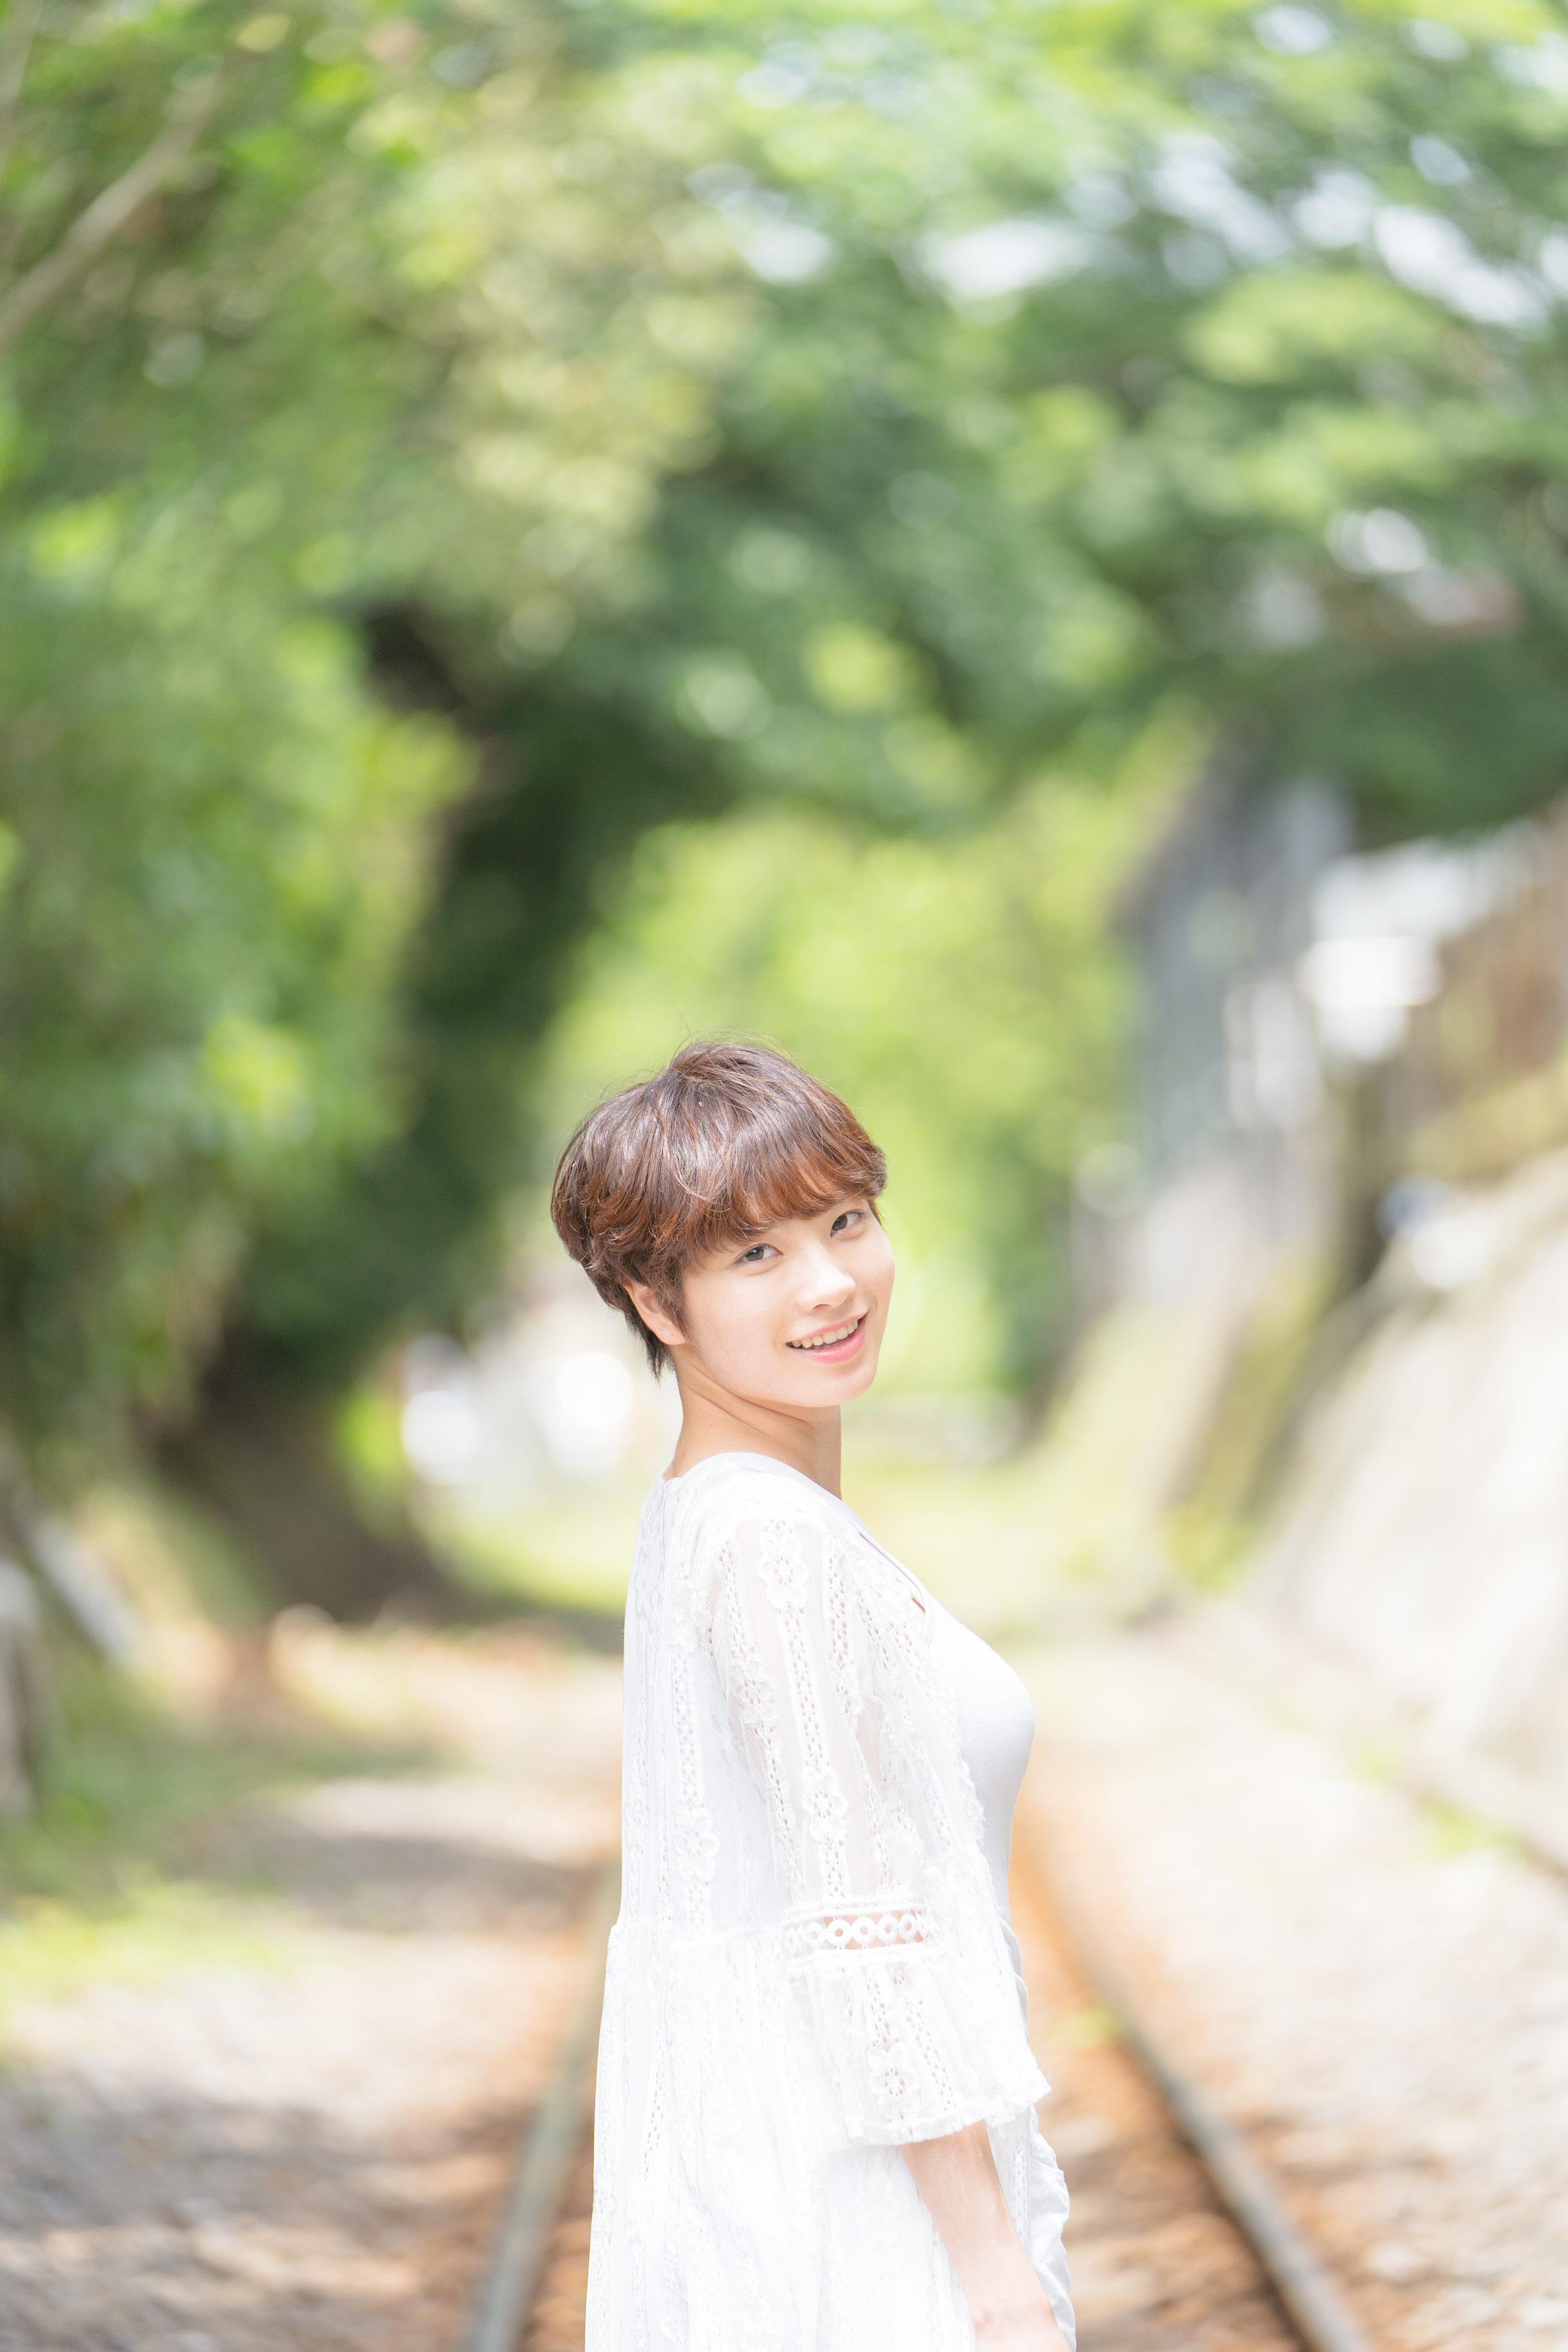 Sprazzi_Professional_Photography_Photographer_Seoul_Korea_Sion_Original_56.jpg